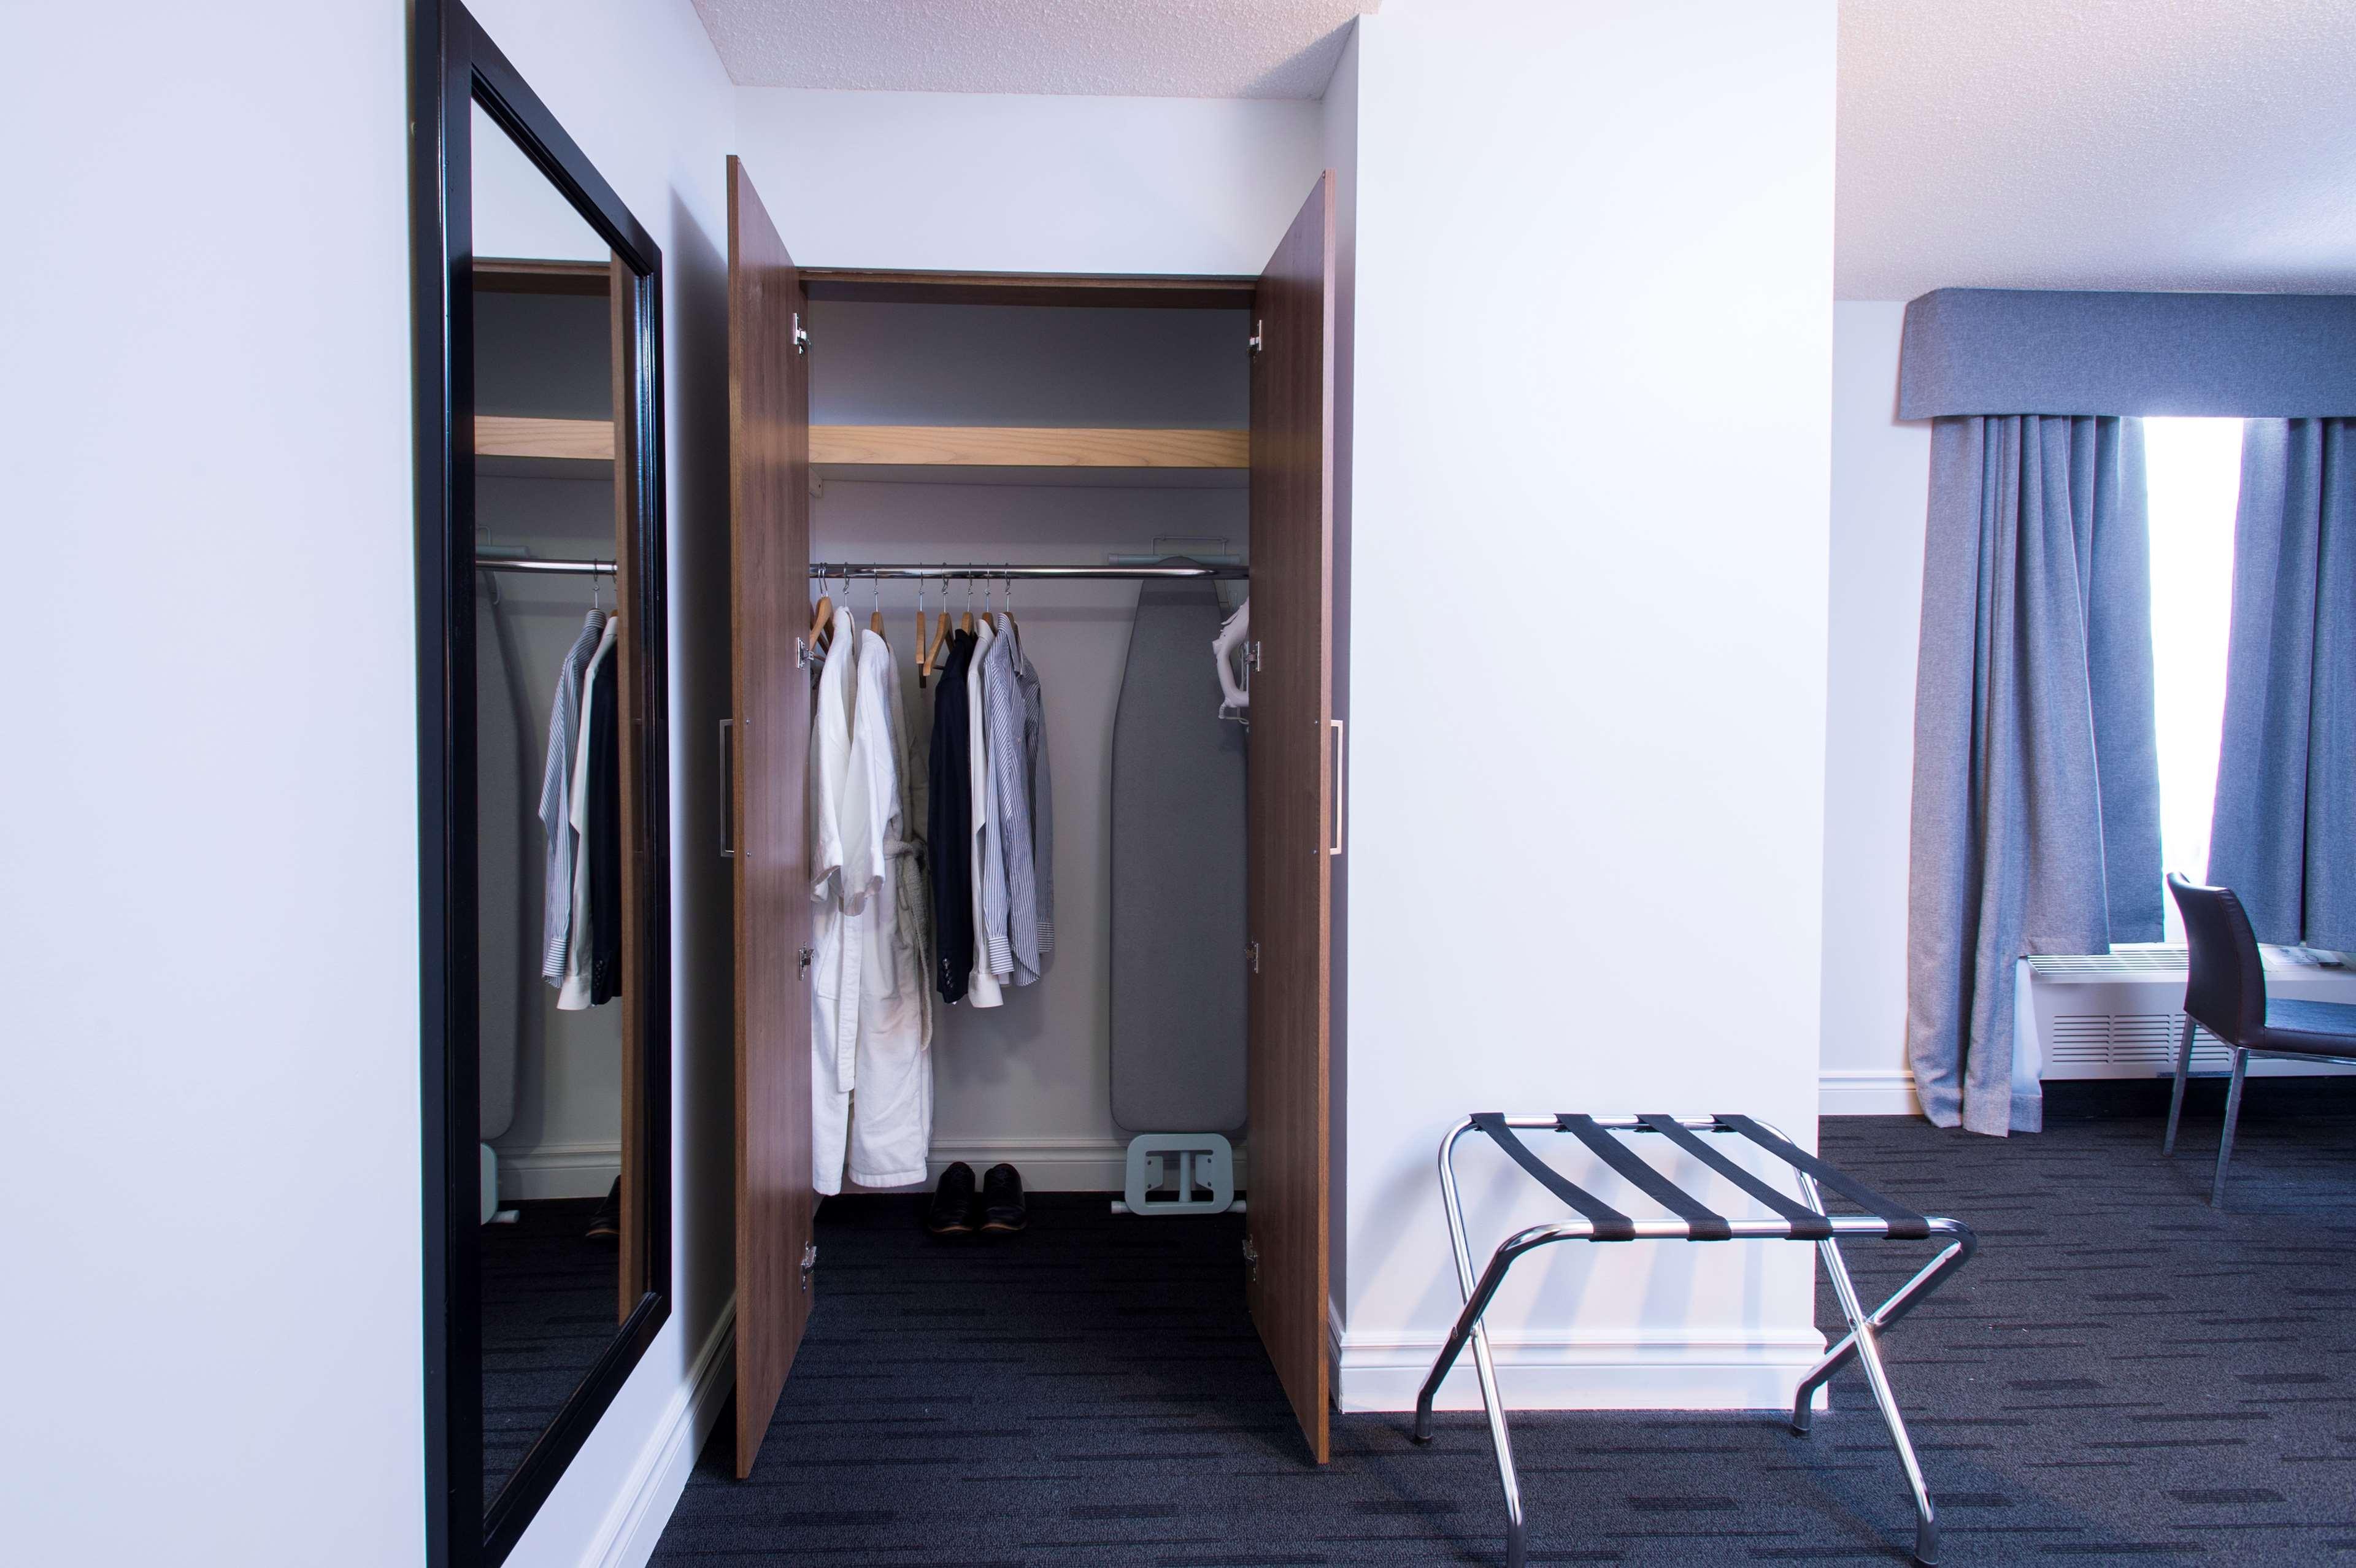 Best Western Plus Hotel Albert Rouyn-Noranda à Rouyn-Noranda: Wardrobe